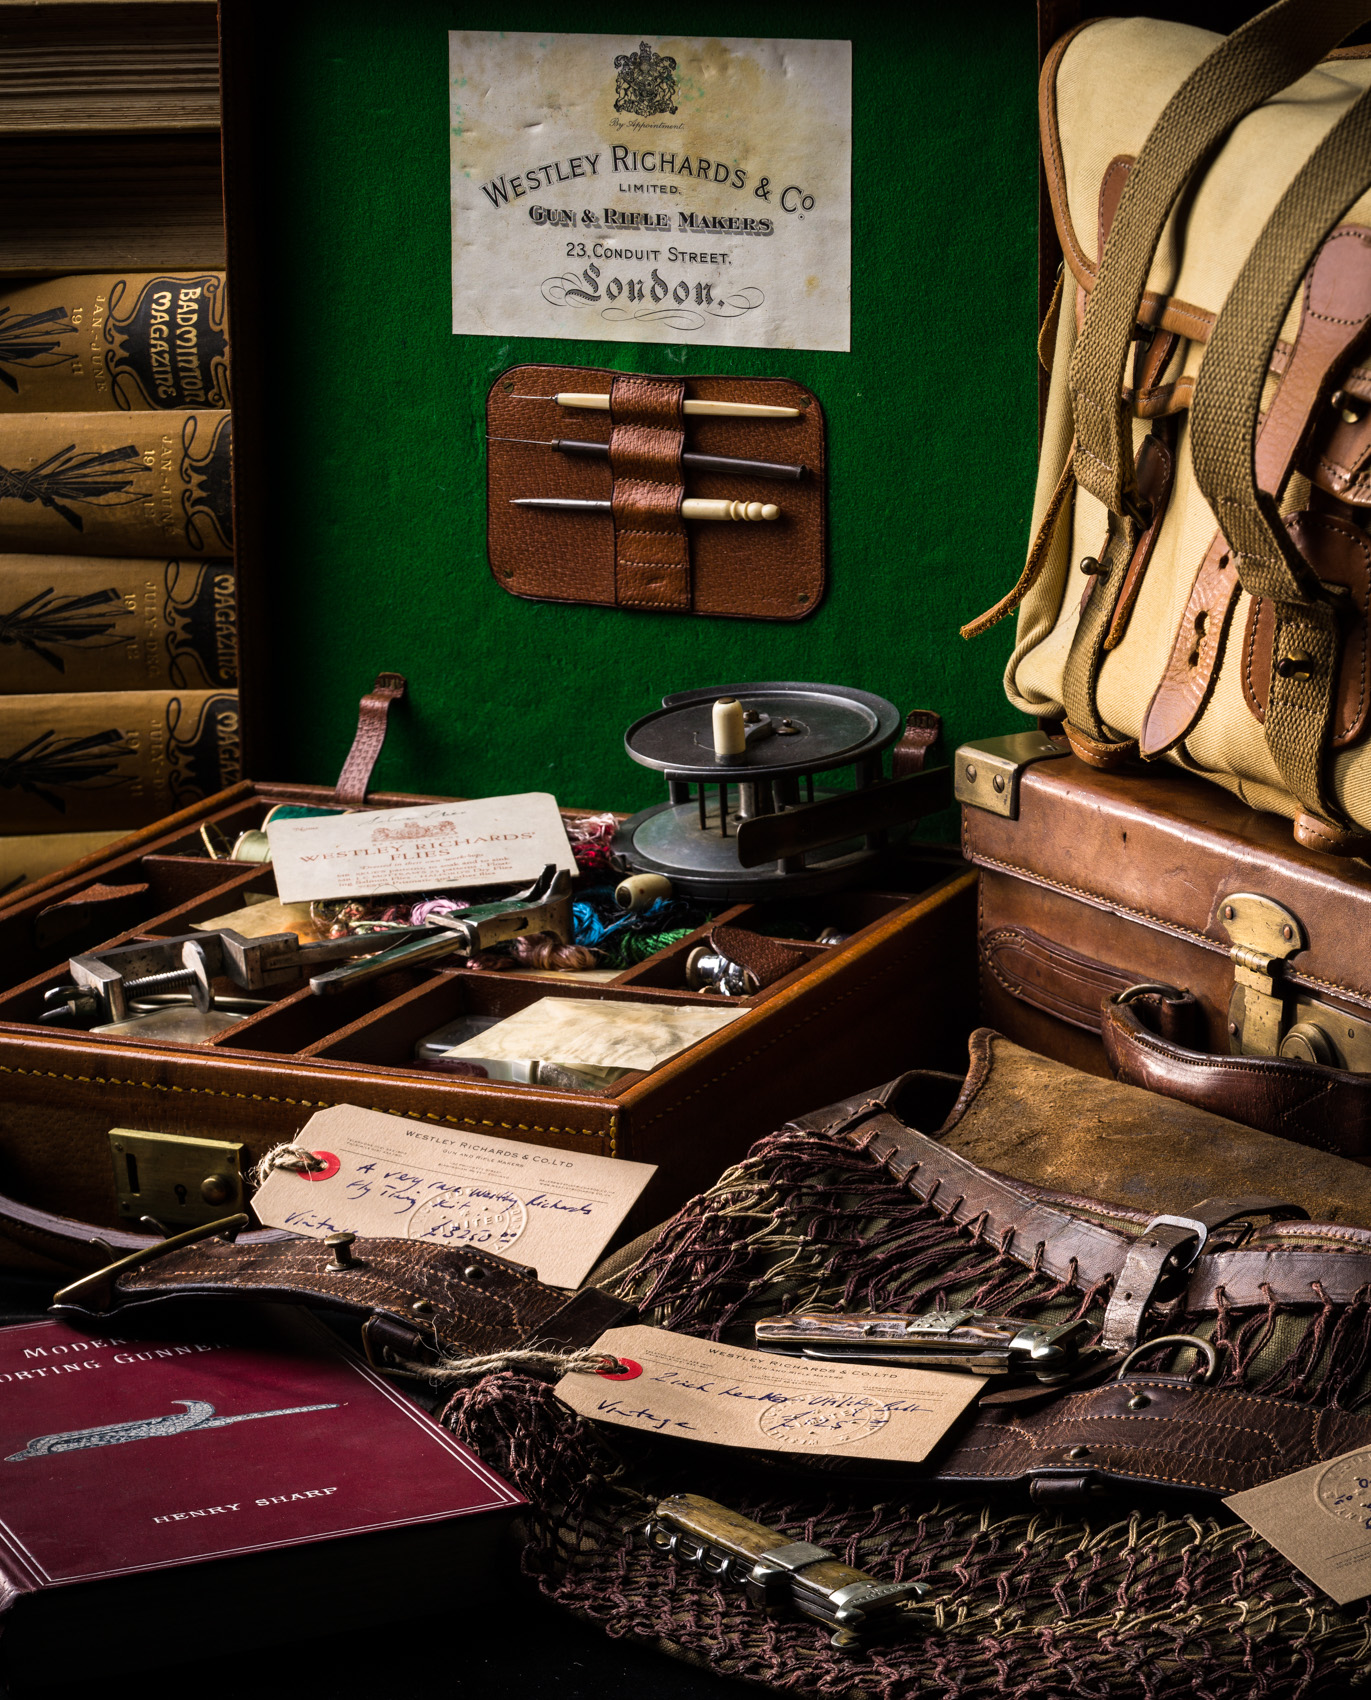 Ephemera and Vintage Sporting kit at Westley Richards.